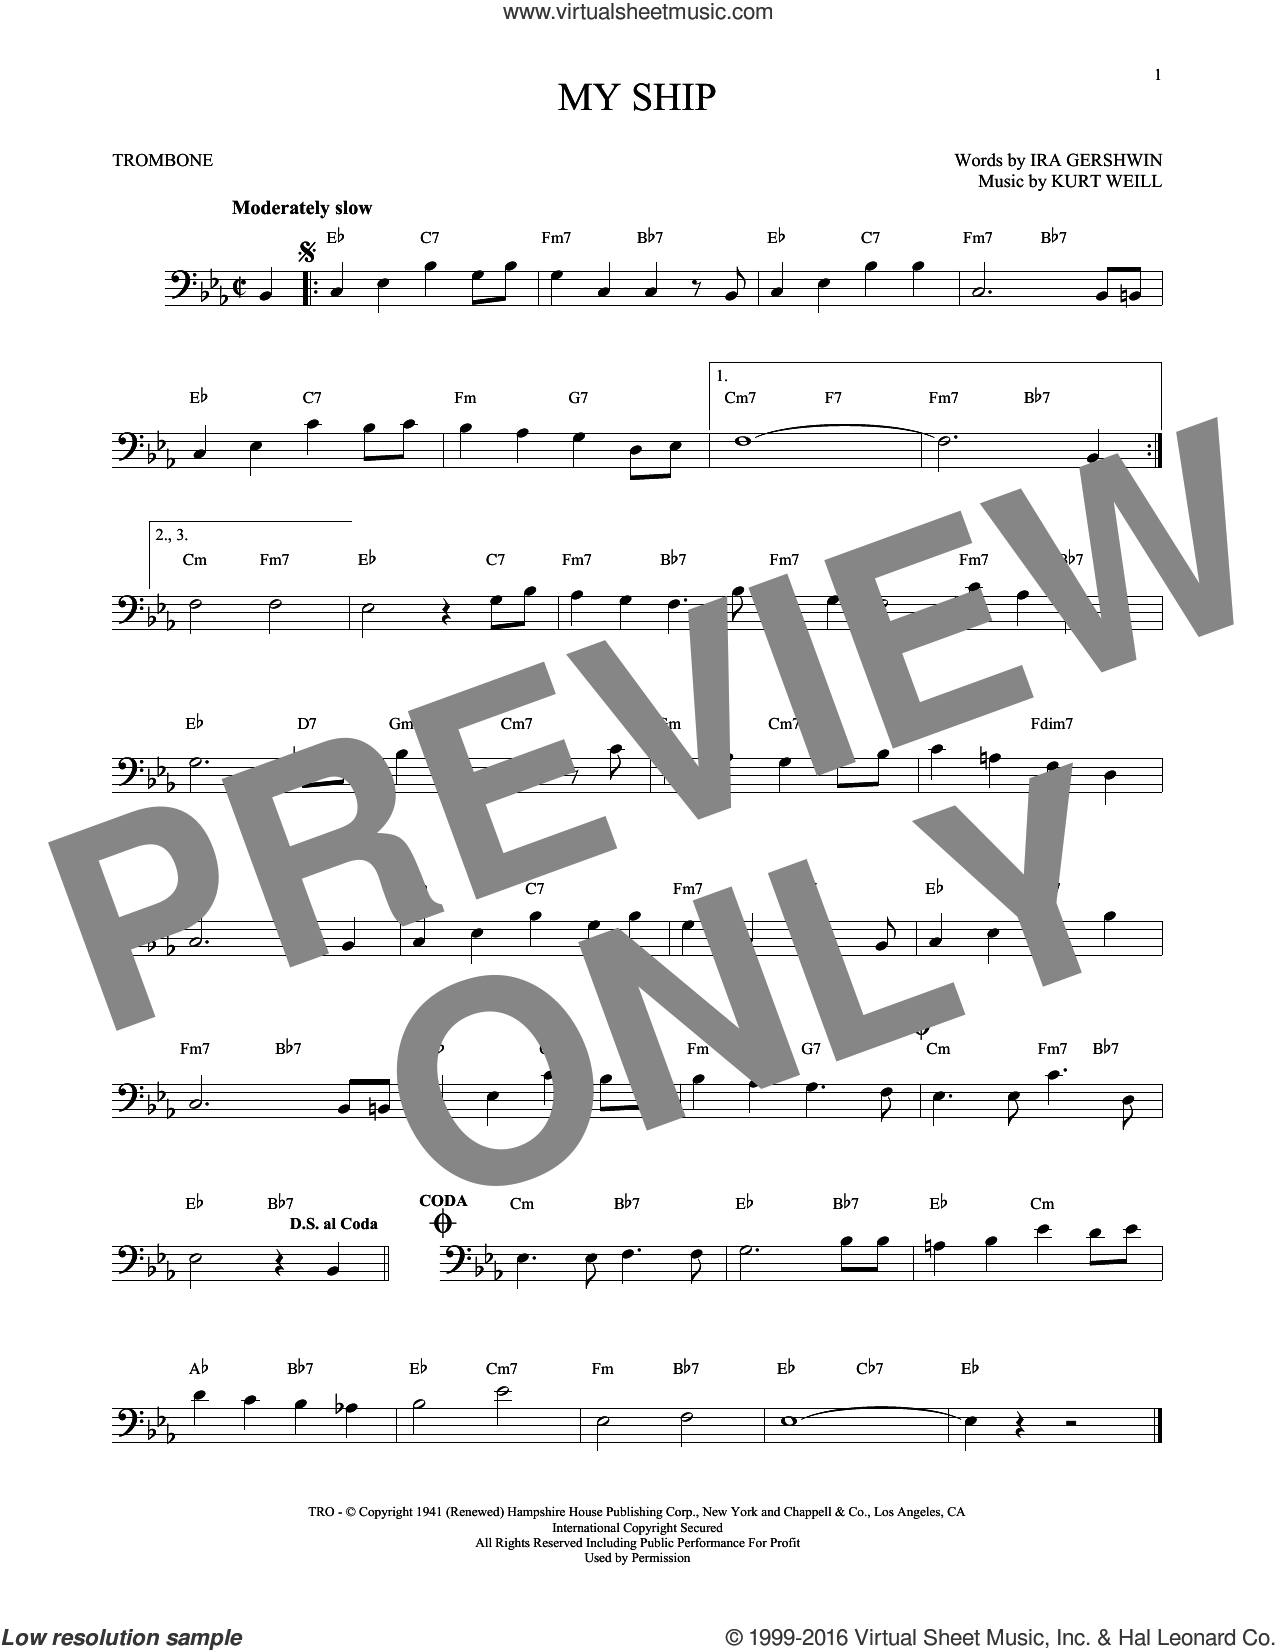 My Ship sheet music for trombone solo by Ira Gershwin and Kurt Weill, intermediate skill level